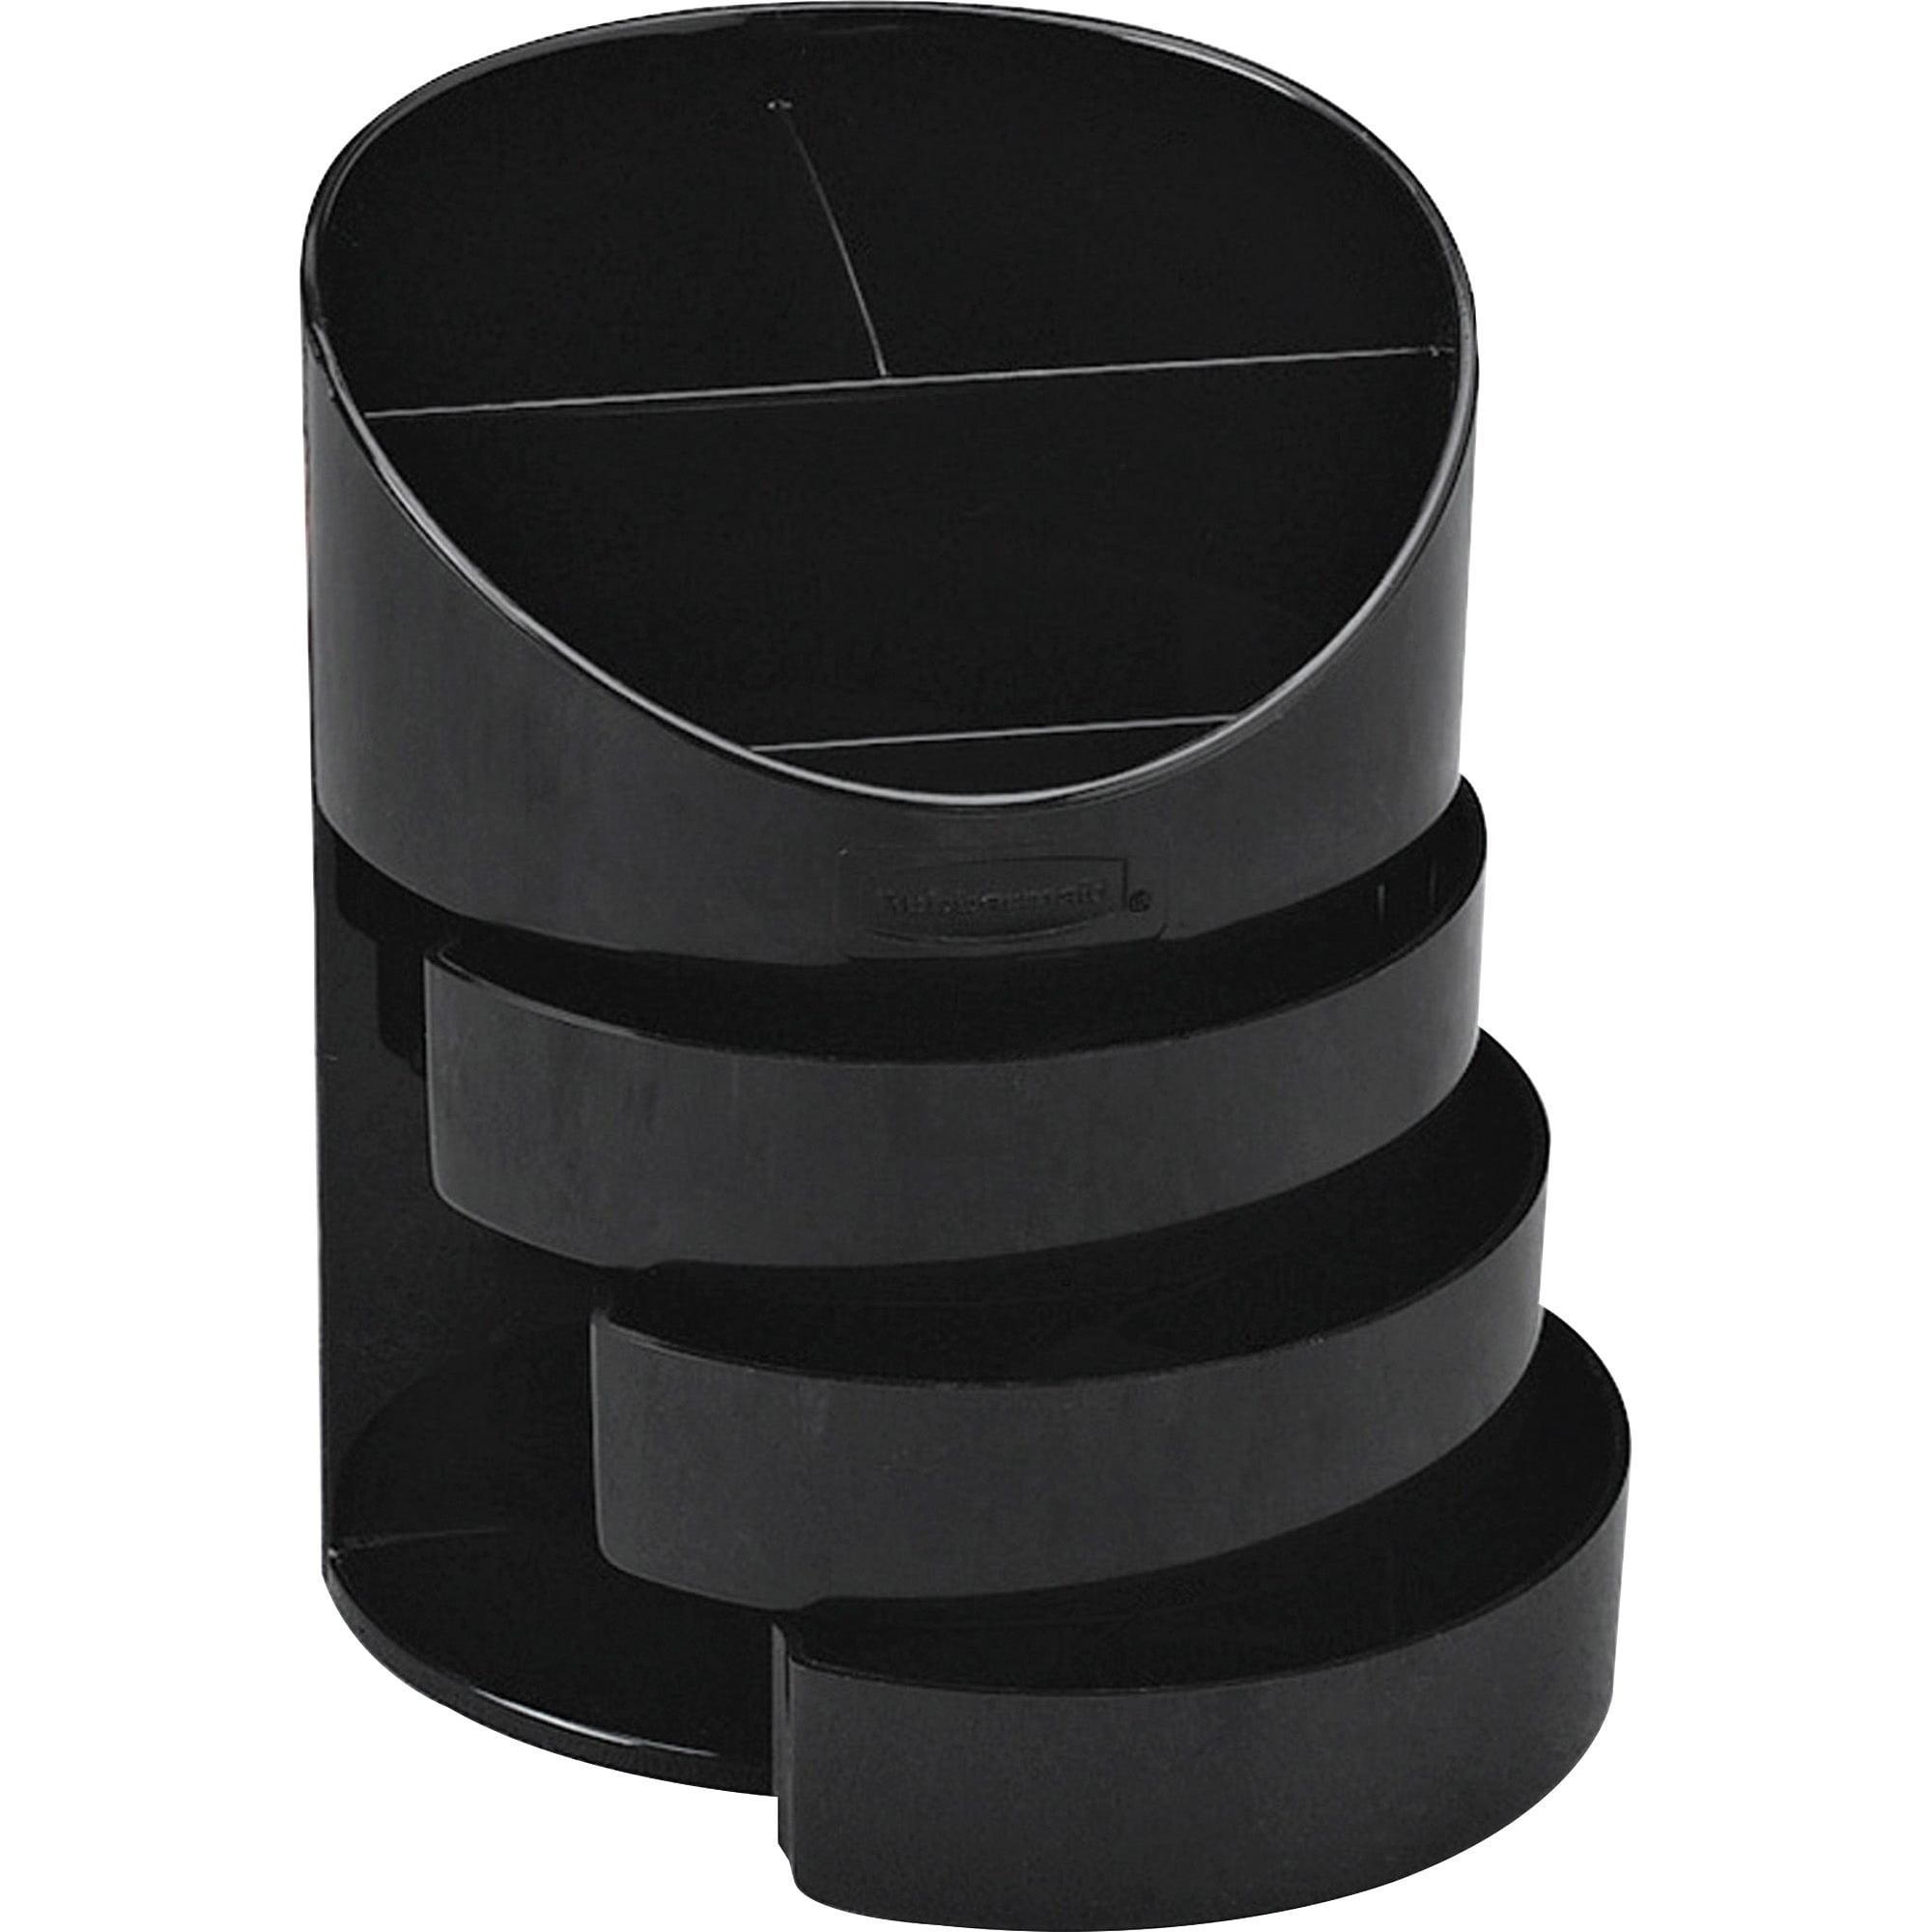 Rubbermaid, RUB14095ROS, 3-Drawer Jumbo Storage Pencil Cups, 1 Each, Black